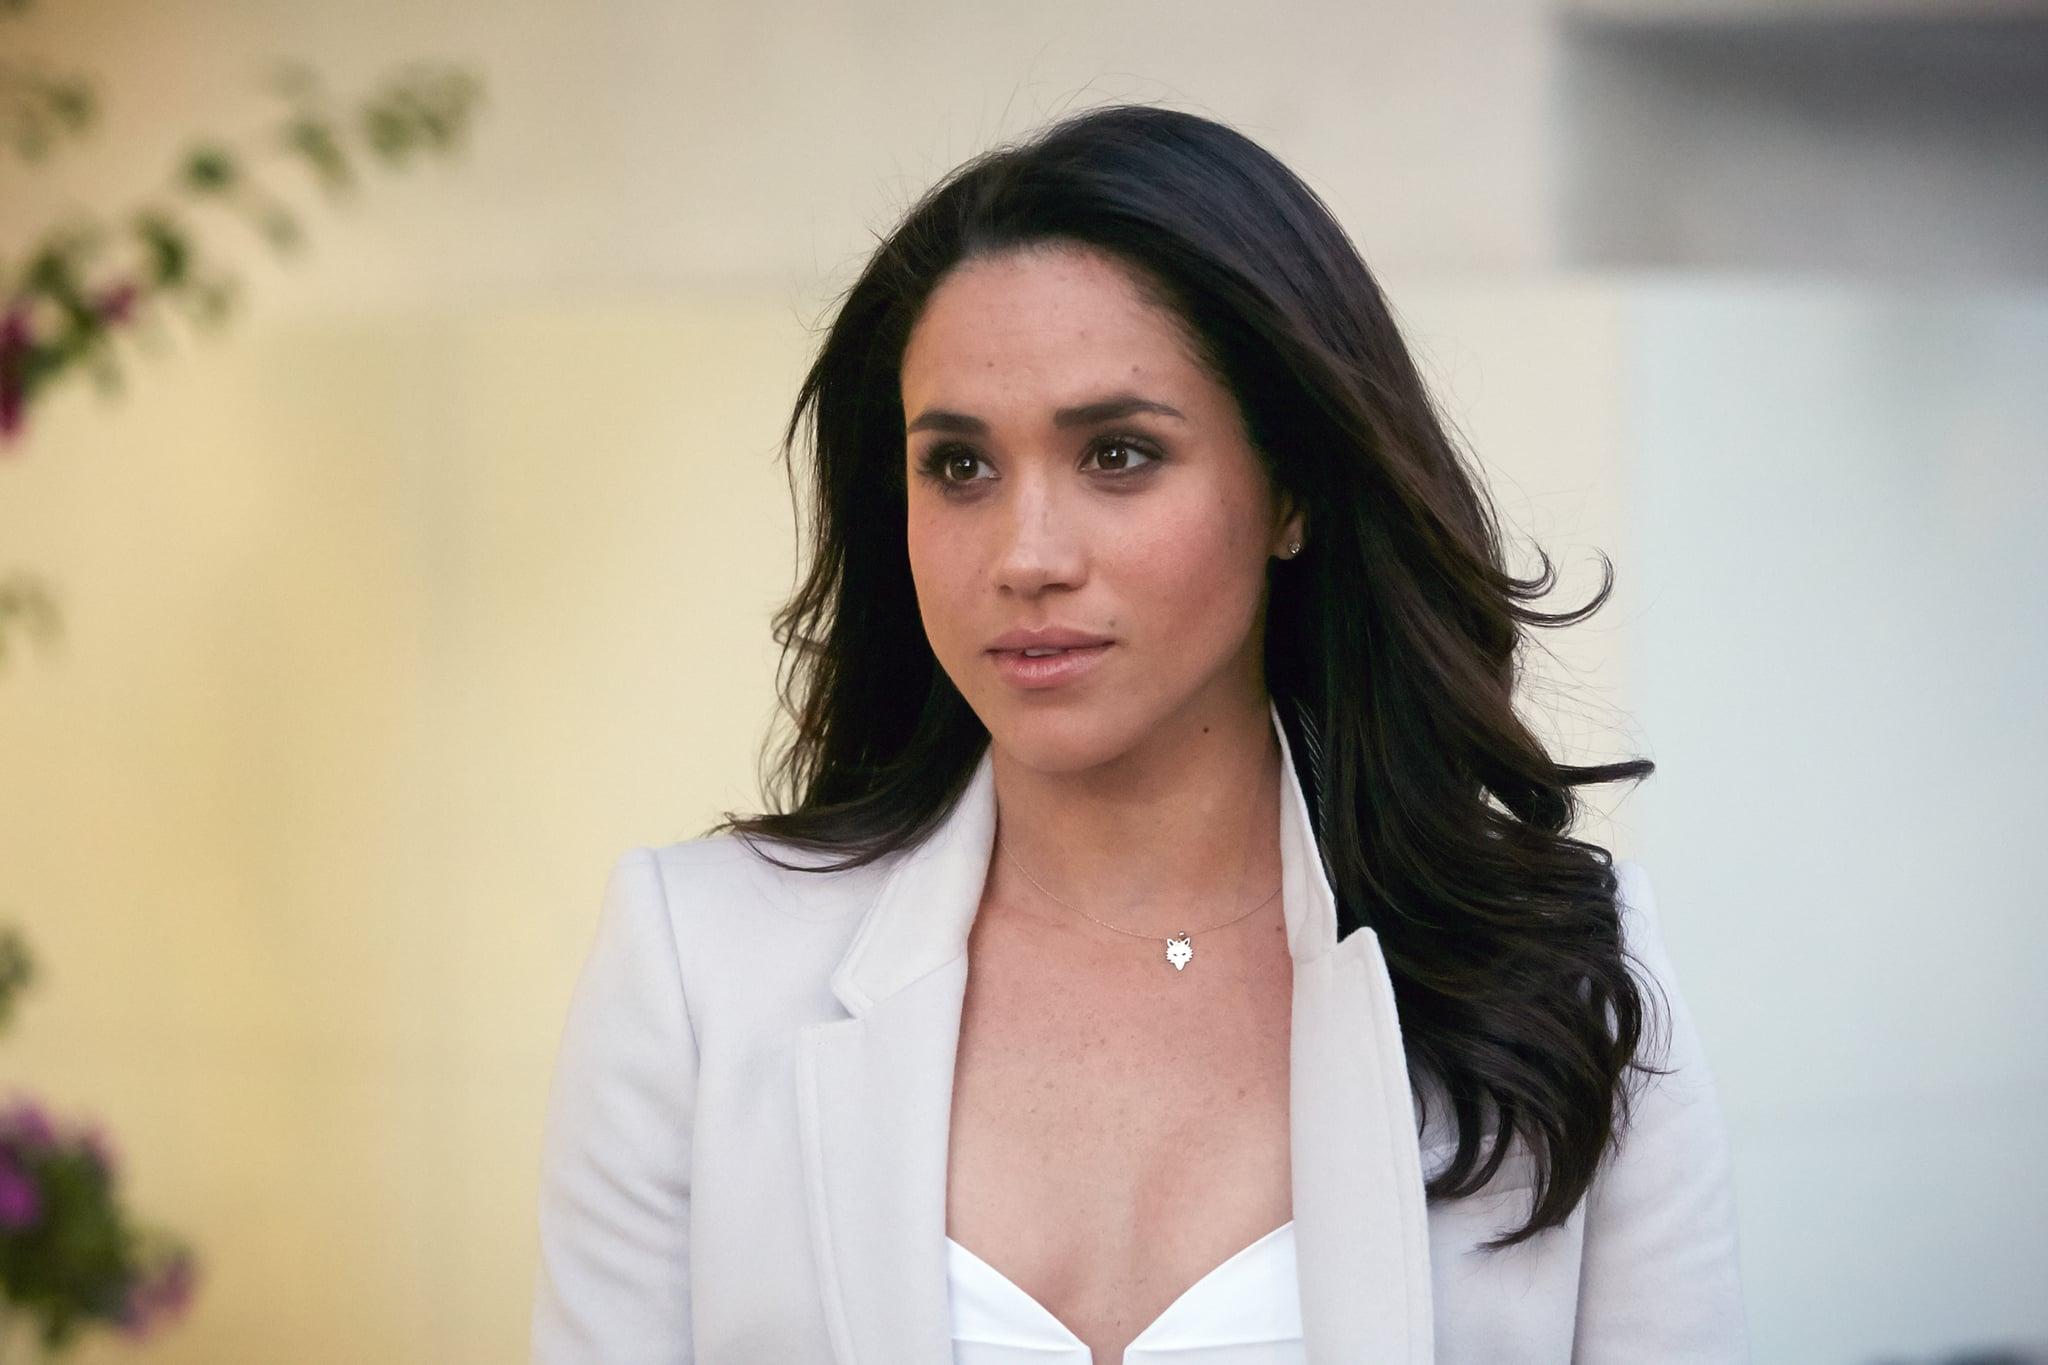 Meghan Markle wears Canadian designer Mackage for first royal engagement